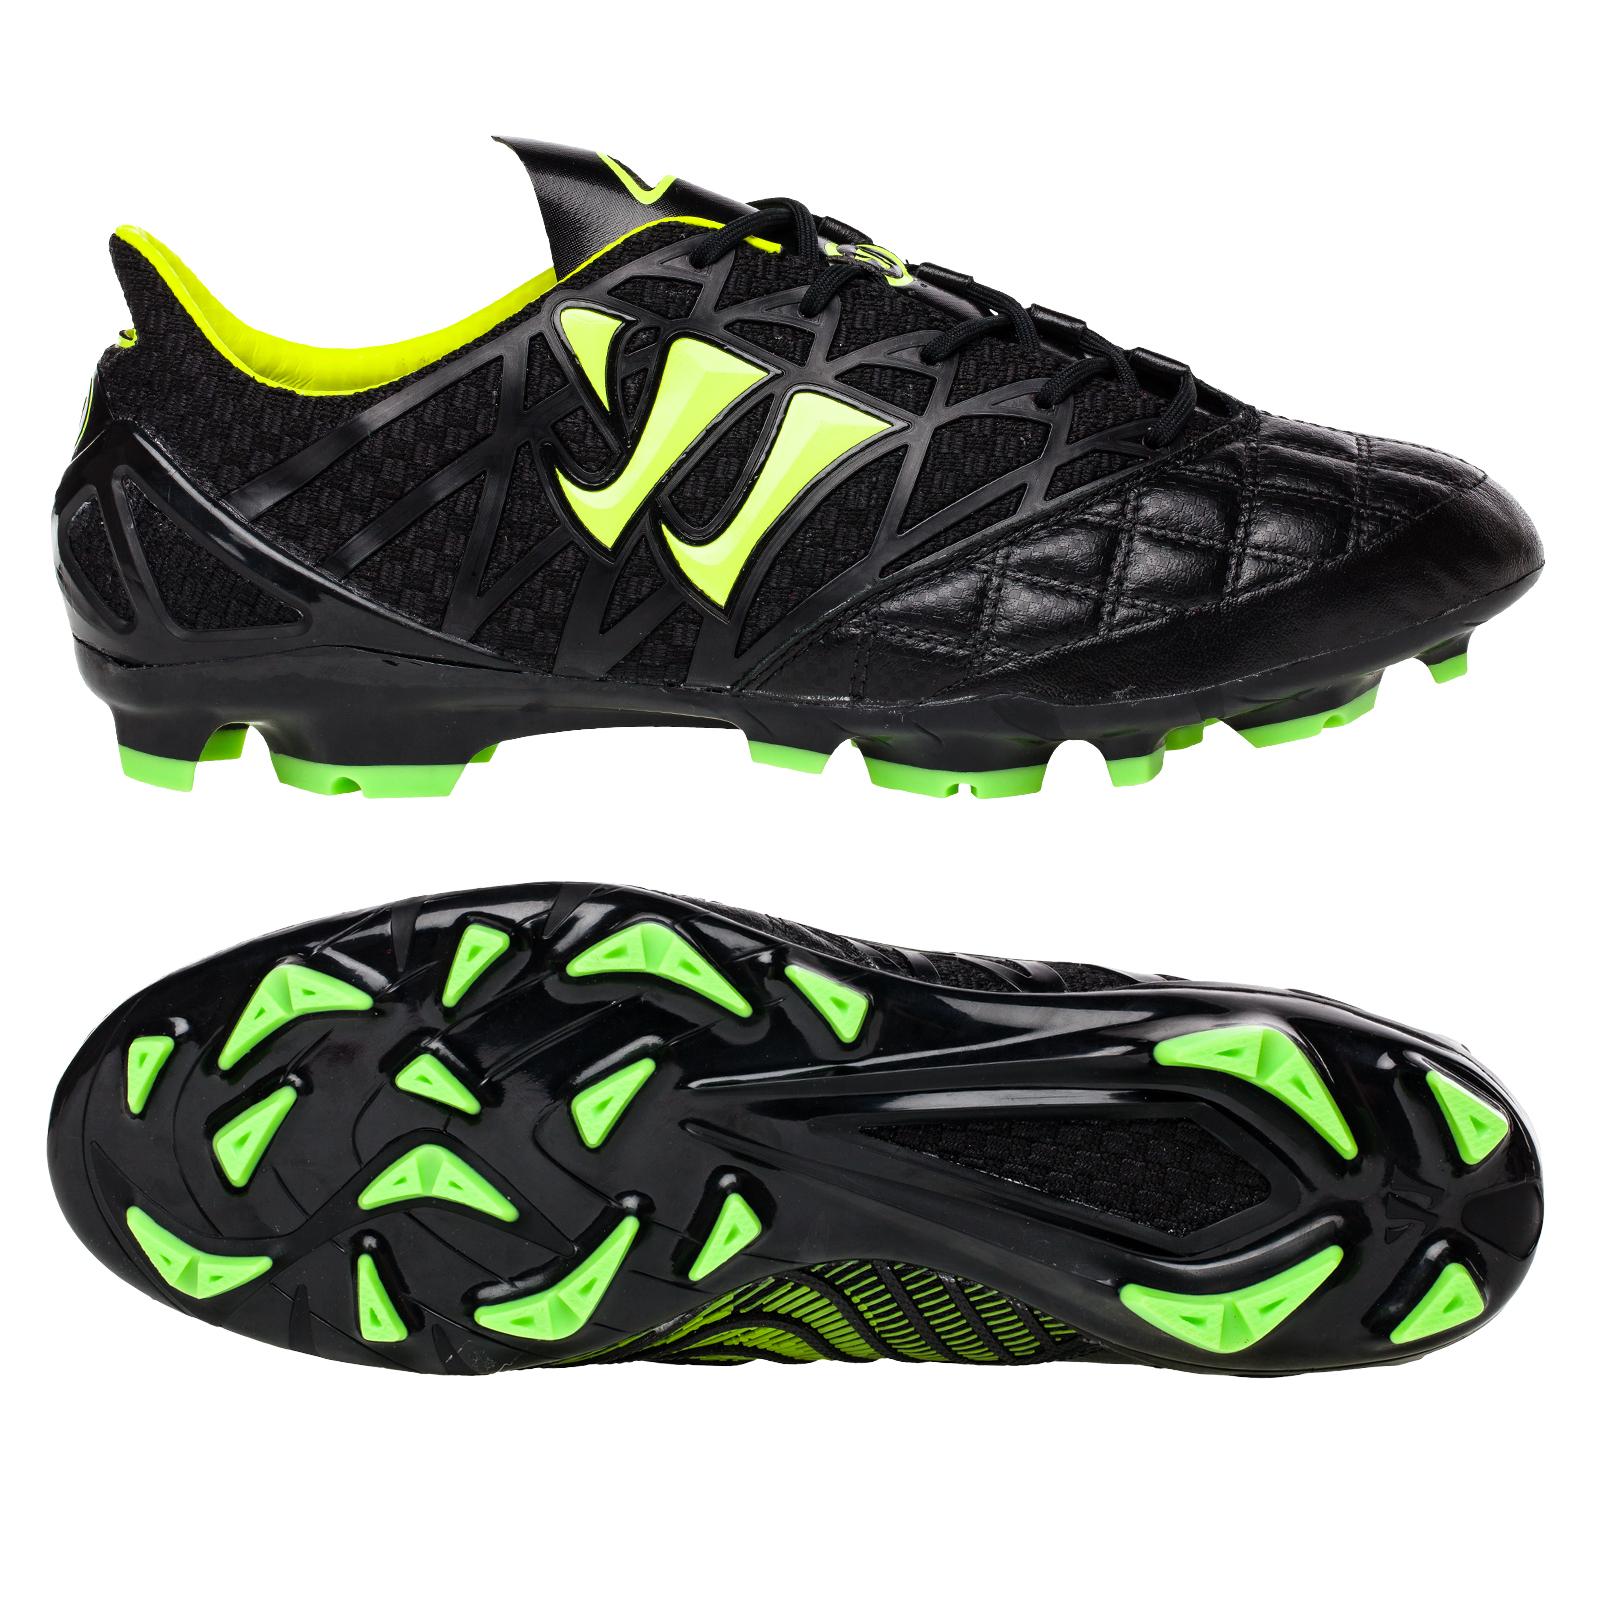 Warrior Sports Gambler K-Lite Firm Ground Football Boots-Blk/Grn Black